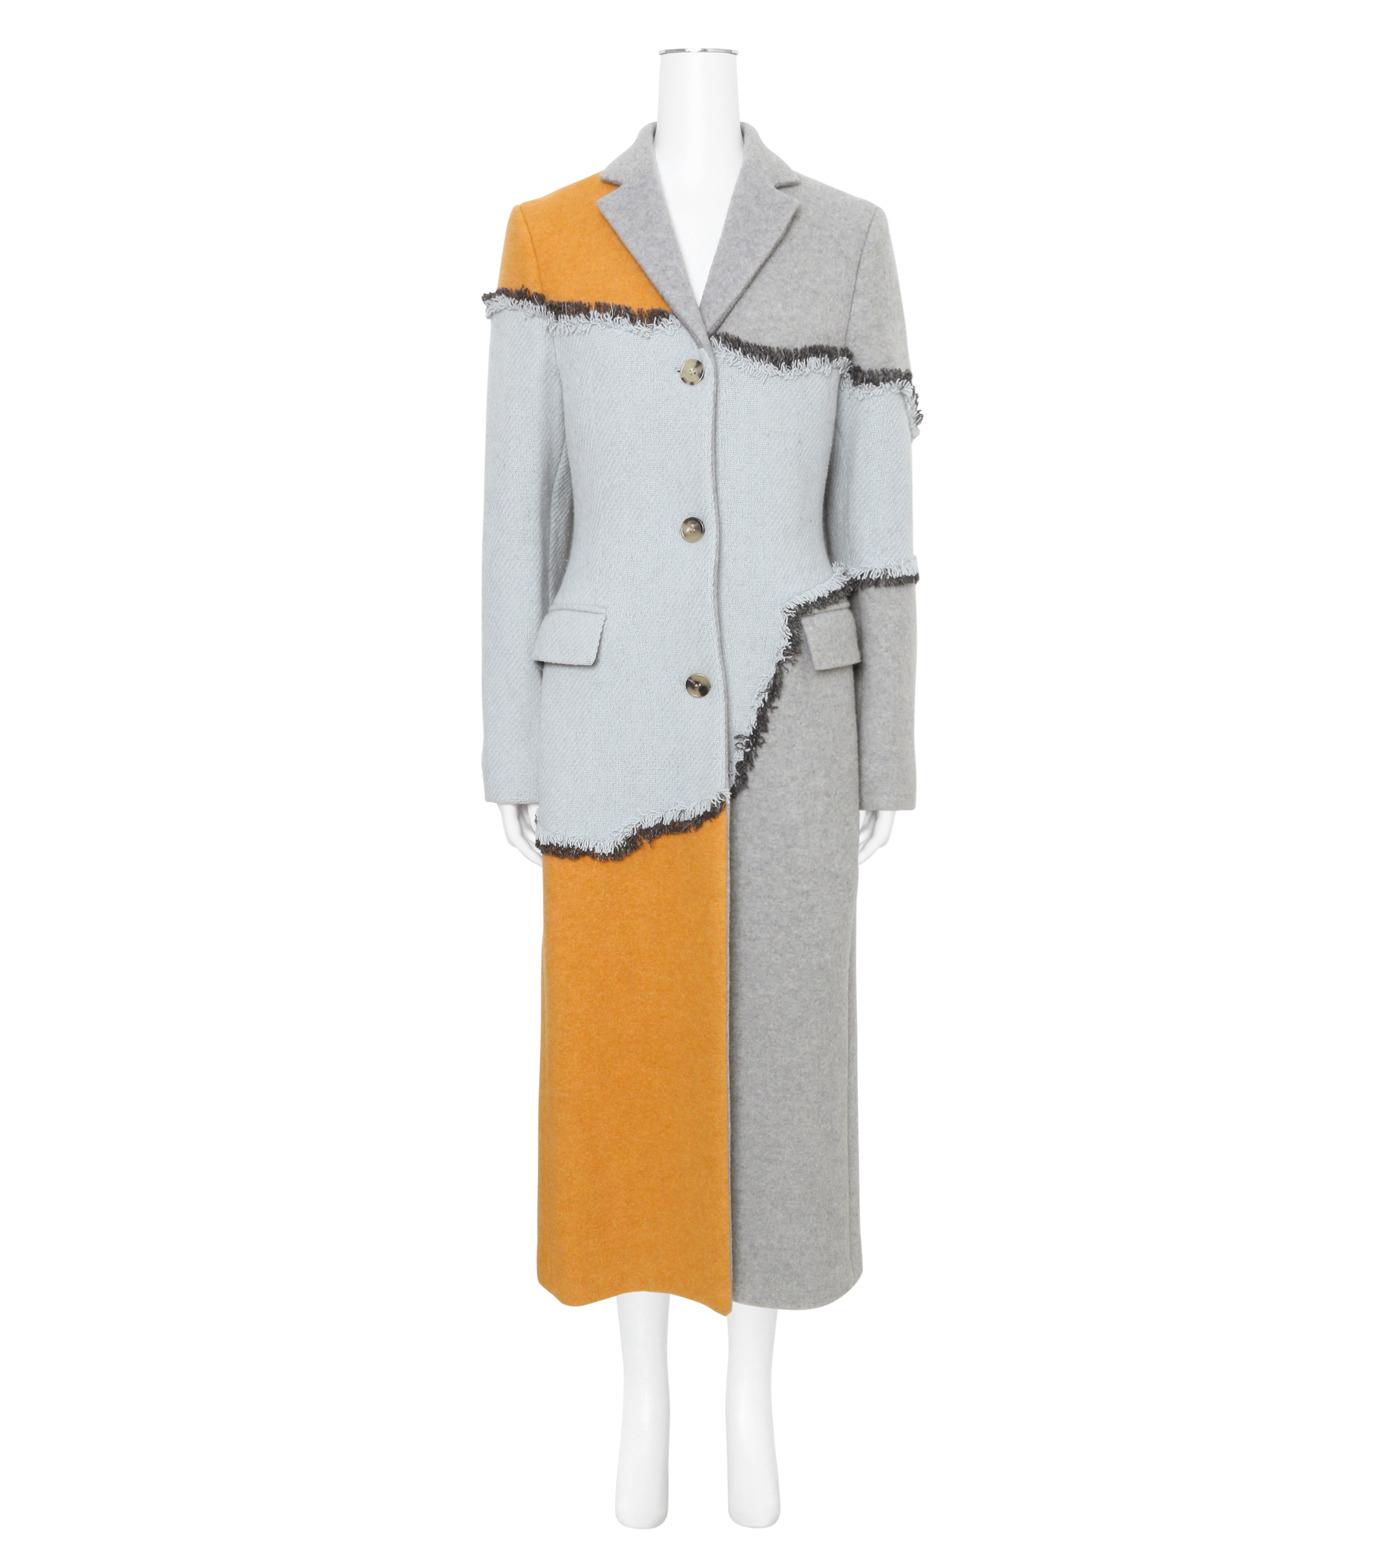 ACNE STUDIOS(アクネ ストゥディオズ)のPatchwork Fitted Coat-GRAY(コート/coat)-12BC63-11 拡大詳細画像1